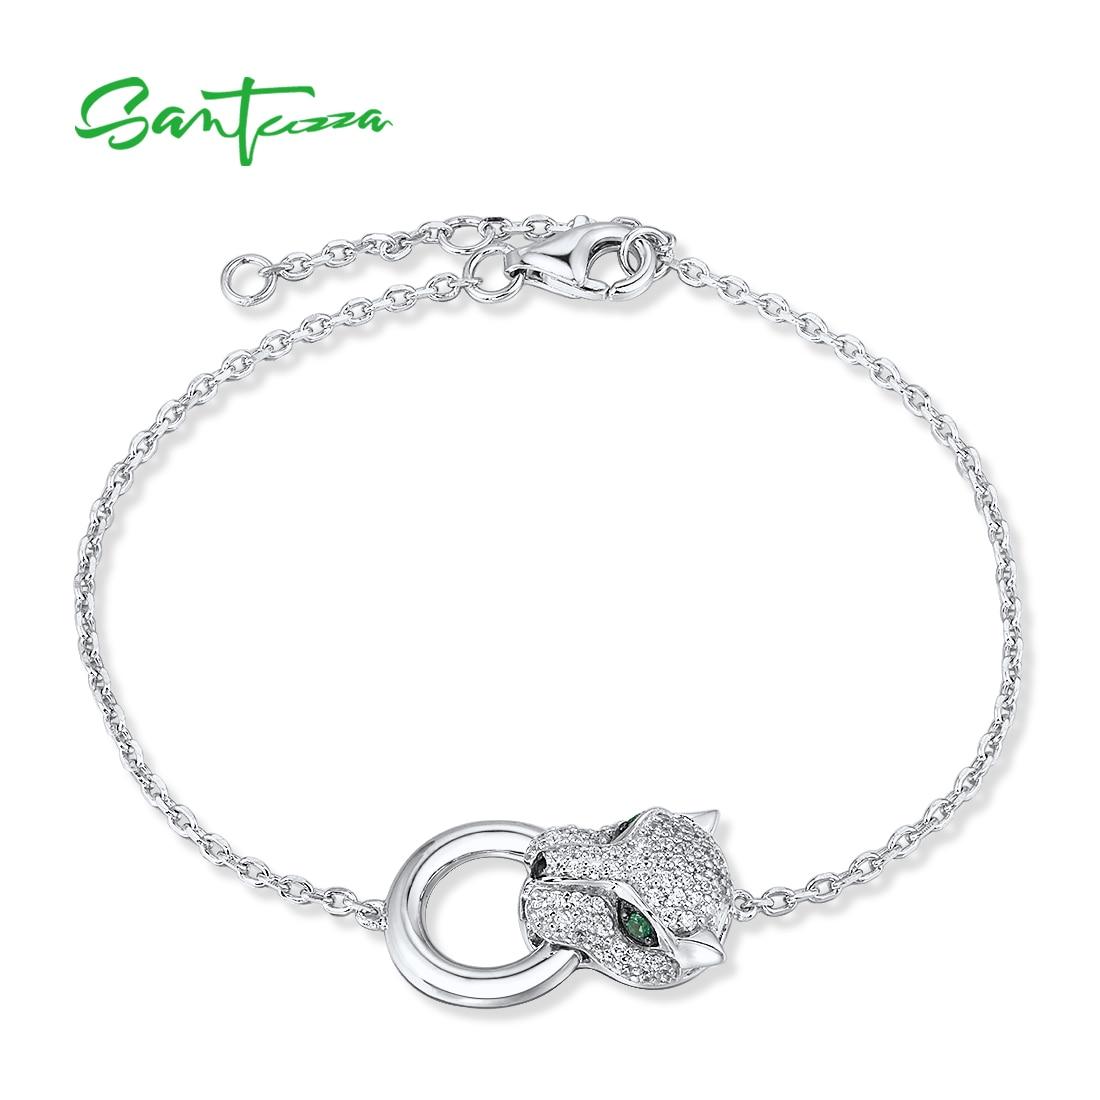 Glitzernder Panther-Kopf an feinem Armkettchen | 925 Armband 925 Armbänder